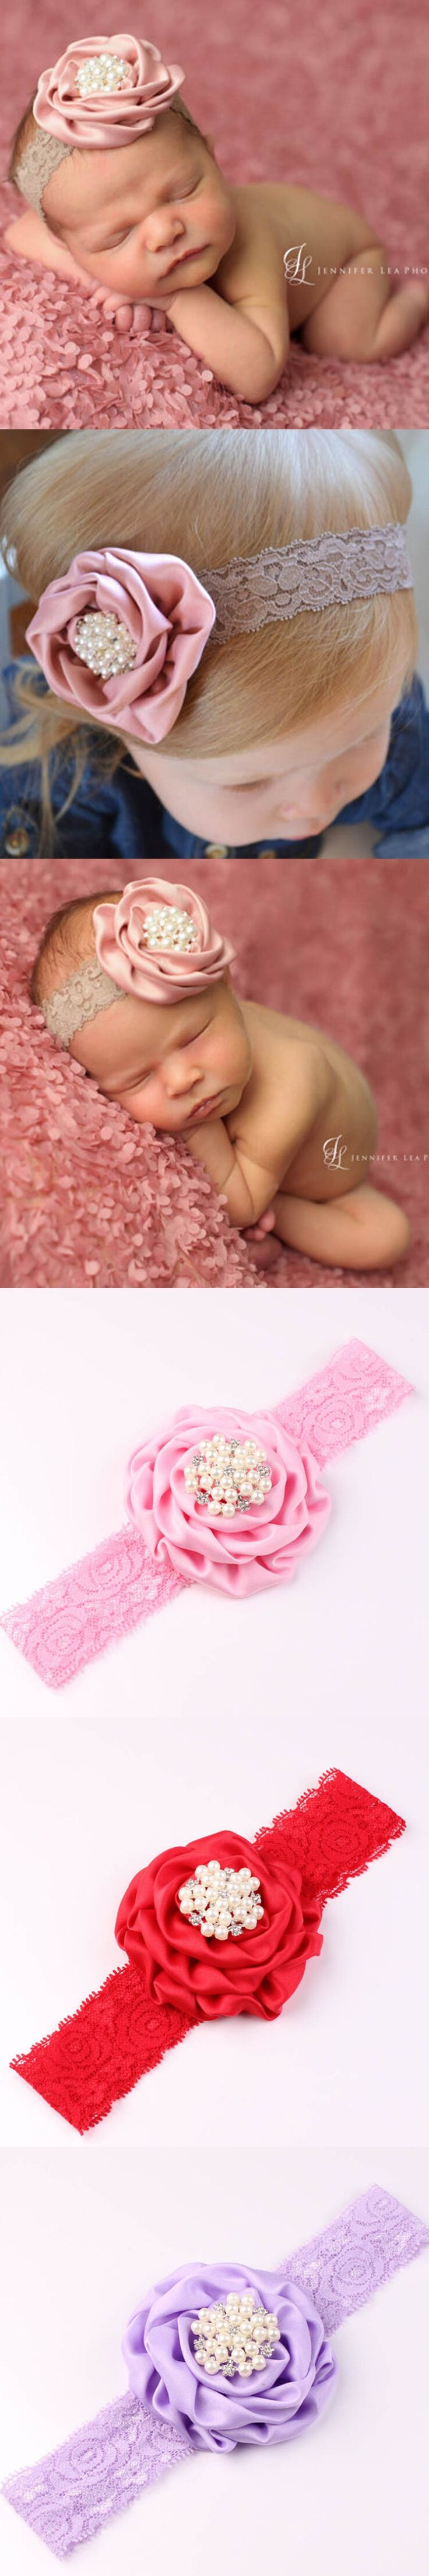 New Hot Fashion Lace Headbands Rose Flower Crystal Rhinestone Baby Hair Accessories Baby Girl Children Hair Bands Baby Headband